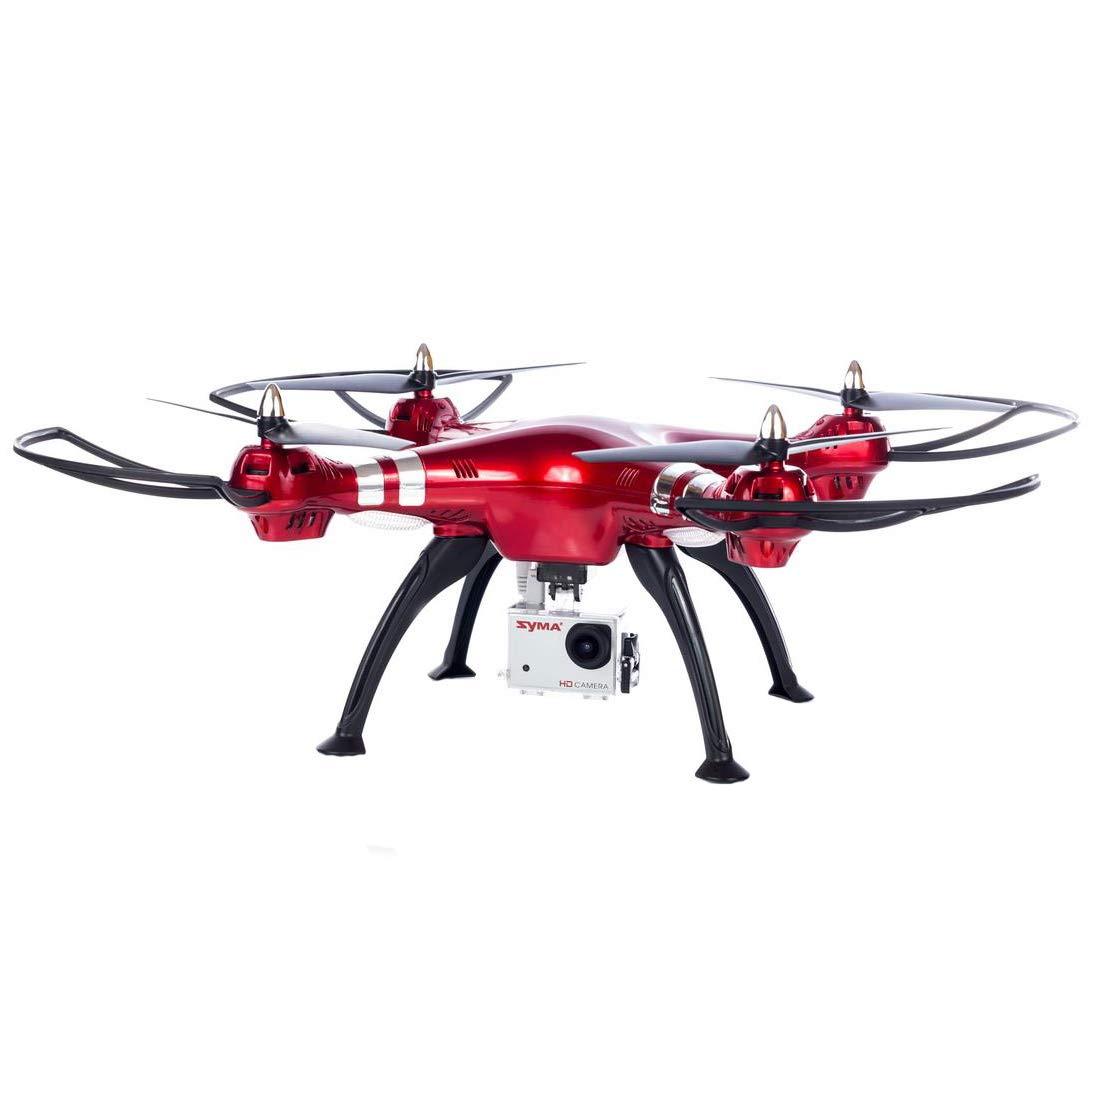 Kiditos Syma 8 MP X8HG RC Drone